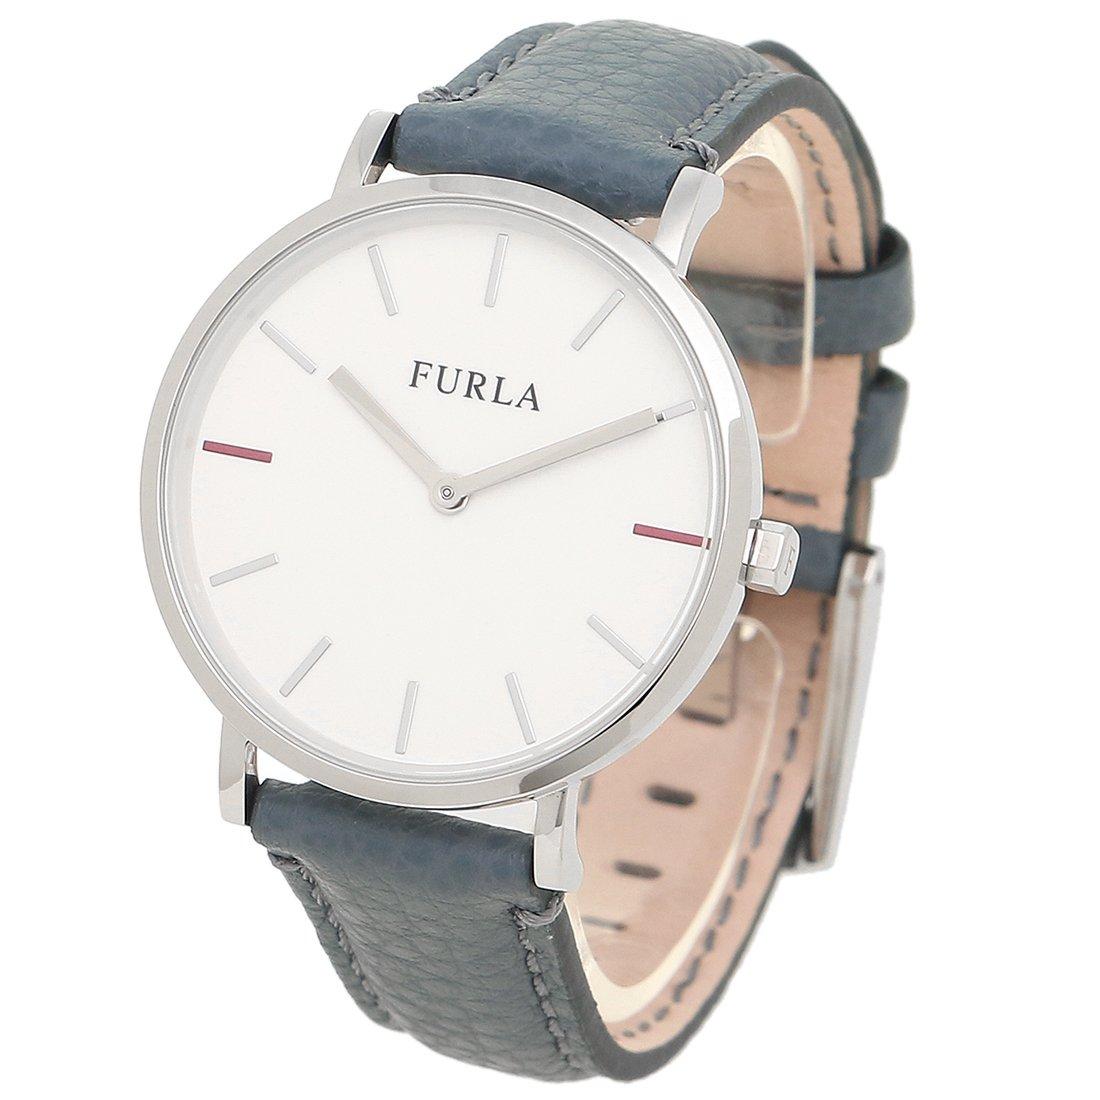 0dc3446e44 Amazon | [フルラ] 腕時計 レディース FURLA R4251108507 899478 W493 WU0 DOL シルバー ブルー ホワイト  [並行輸入品] | 並行輸入品・逆輸入品・中古品(レディース) ...